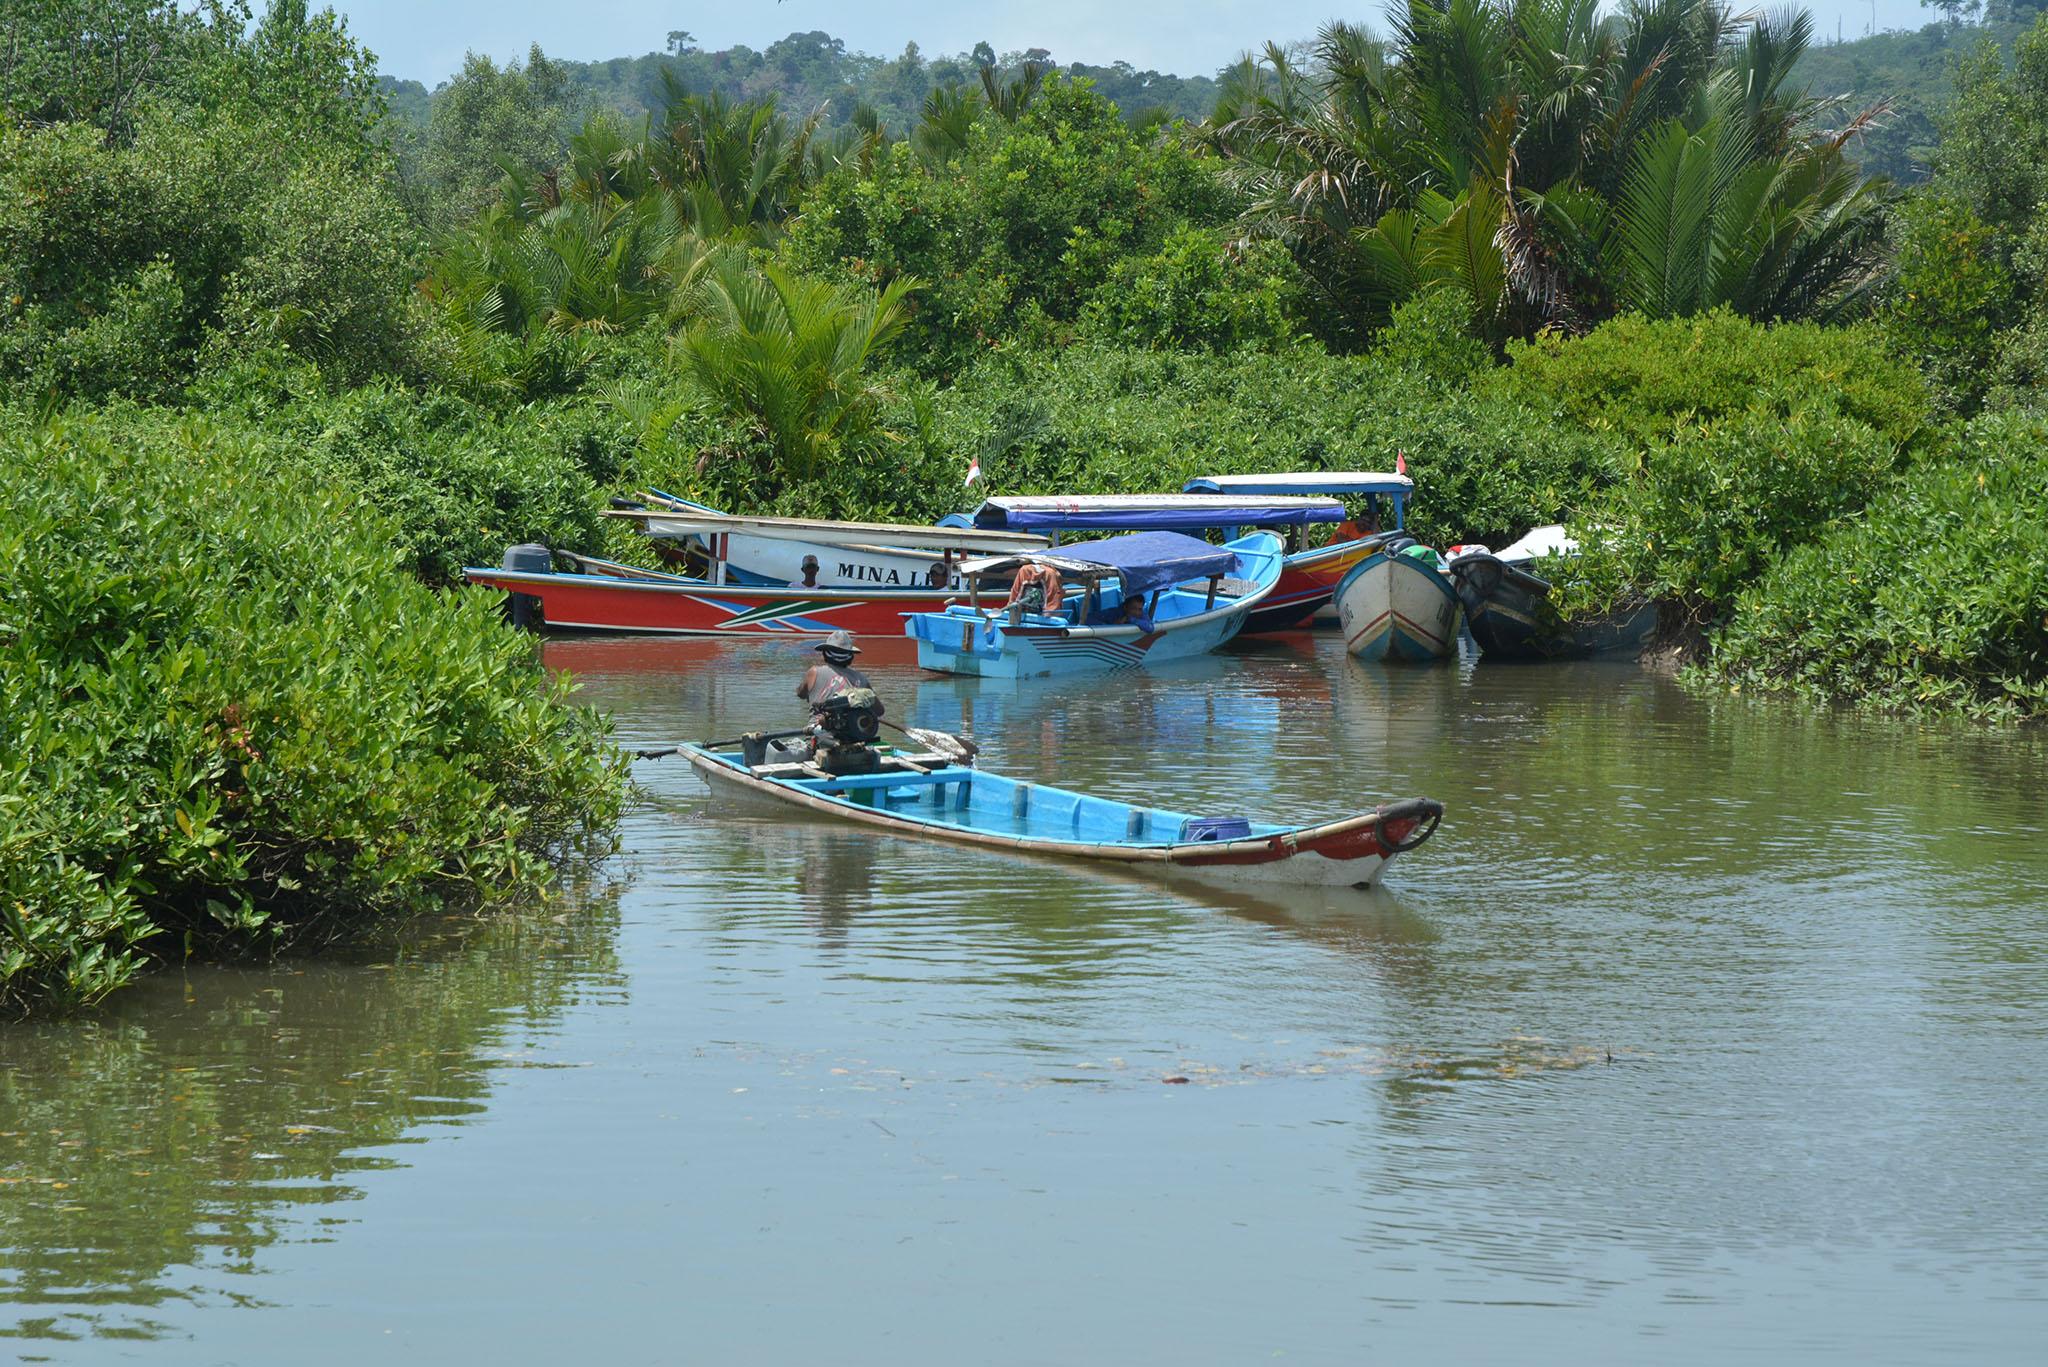 Obyek Wisata Kampung Laut Cilacap Jawa Tengah Hutan Payau Mangrove